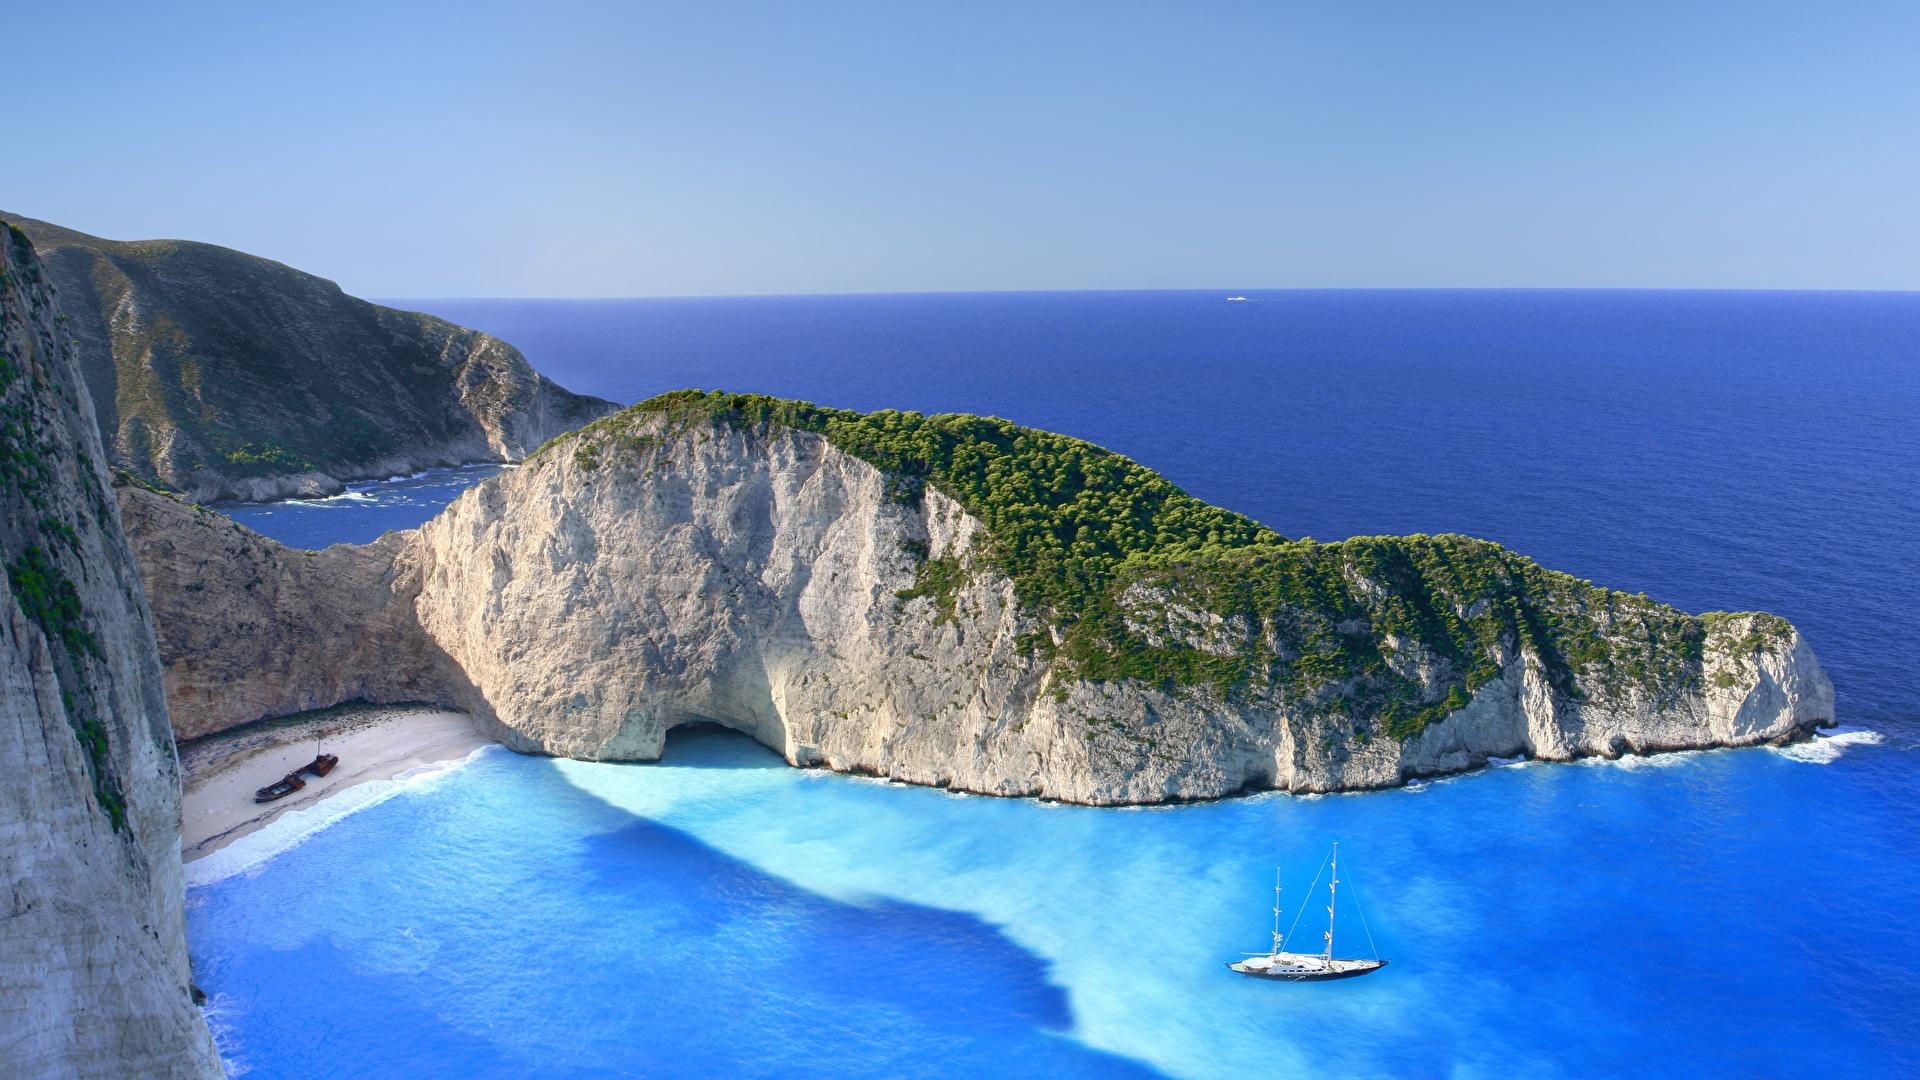 Images Greece Zakynthos Navagio Sea Crag Nature Cove 1920x1080 1920x1080